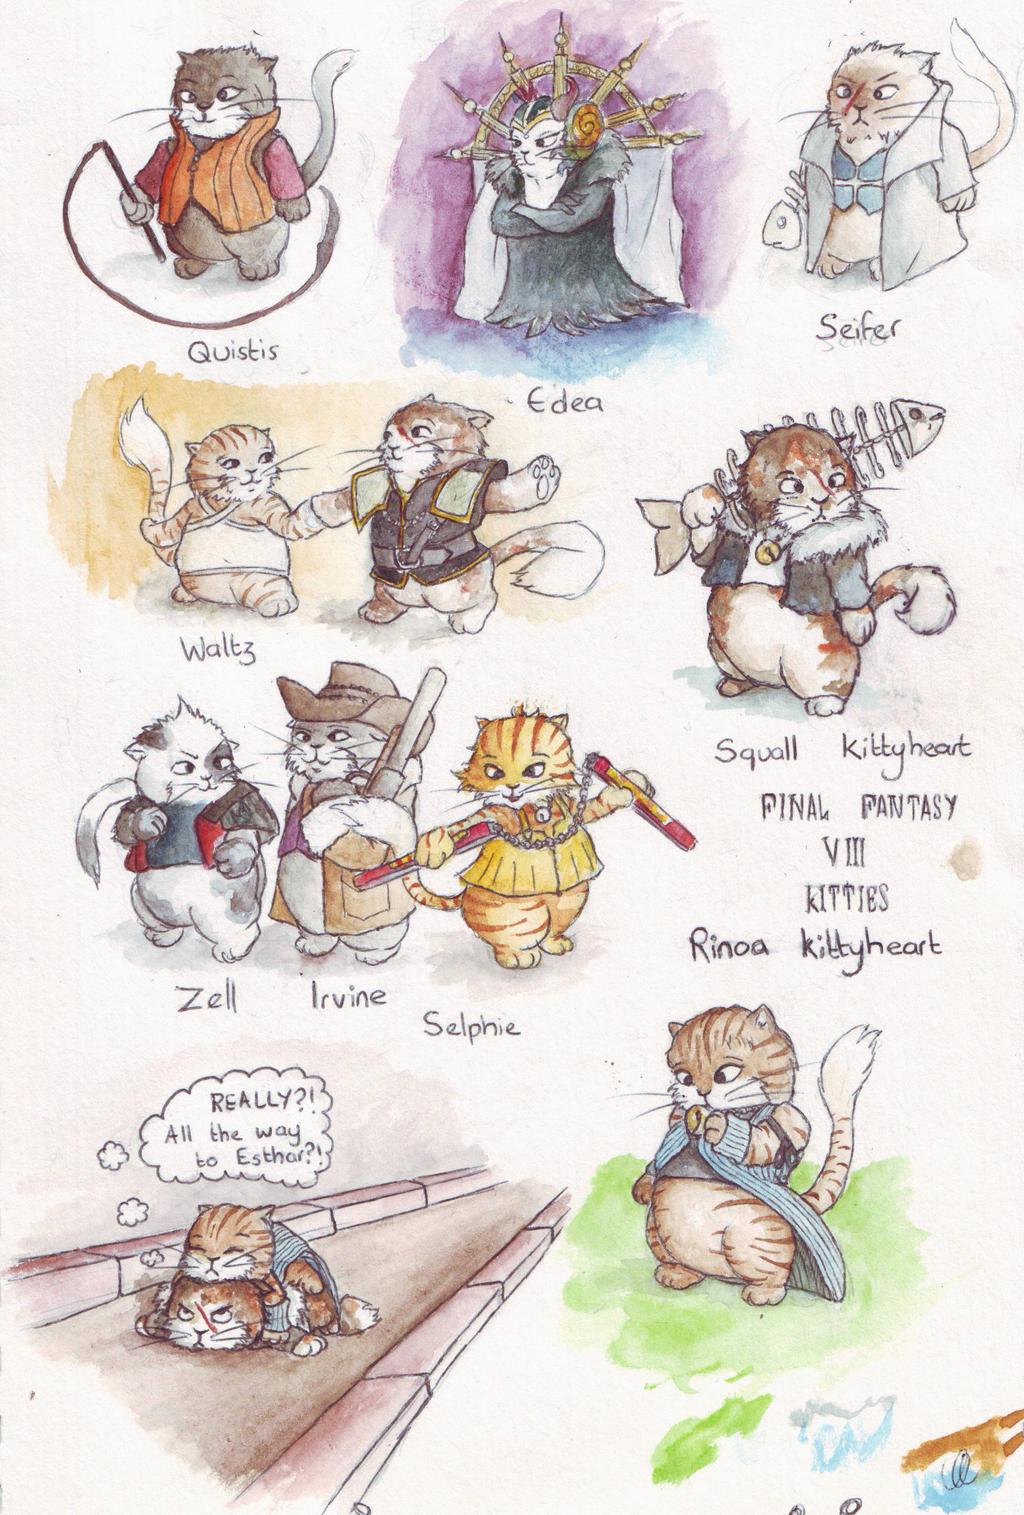 http://img04.deviantart.net/e14f/i/2015/302/1/0/final_fantasy_viii_kitties_by_rustedoooosilver-d9etbp2.jpg